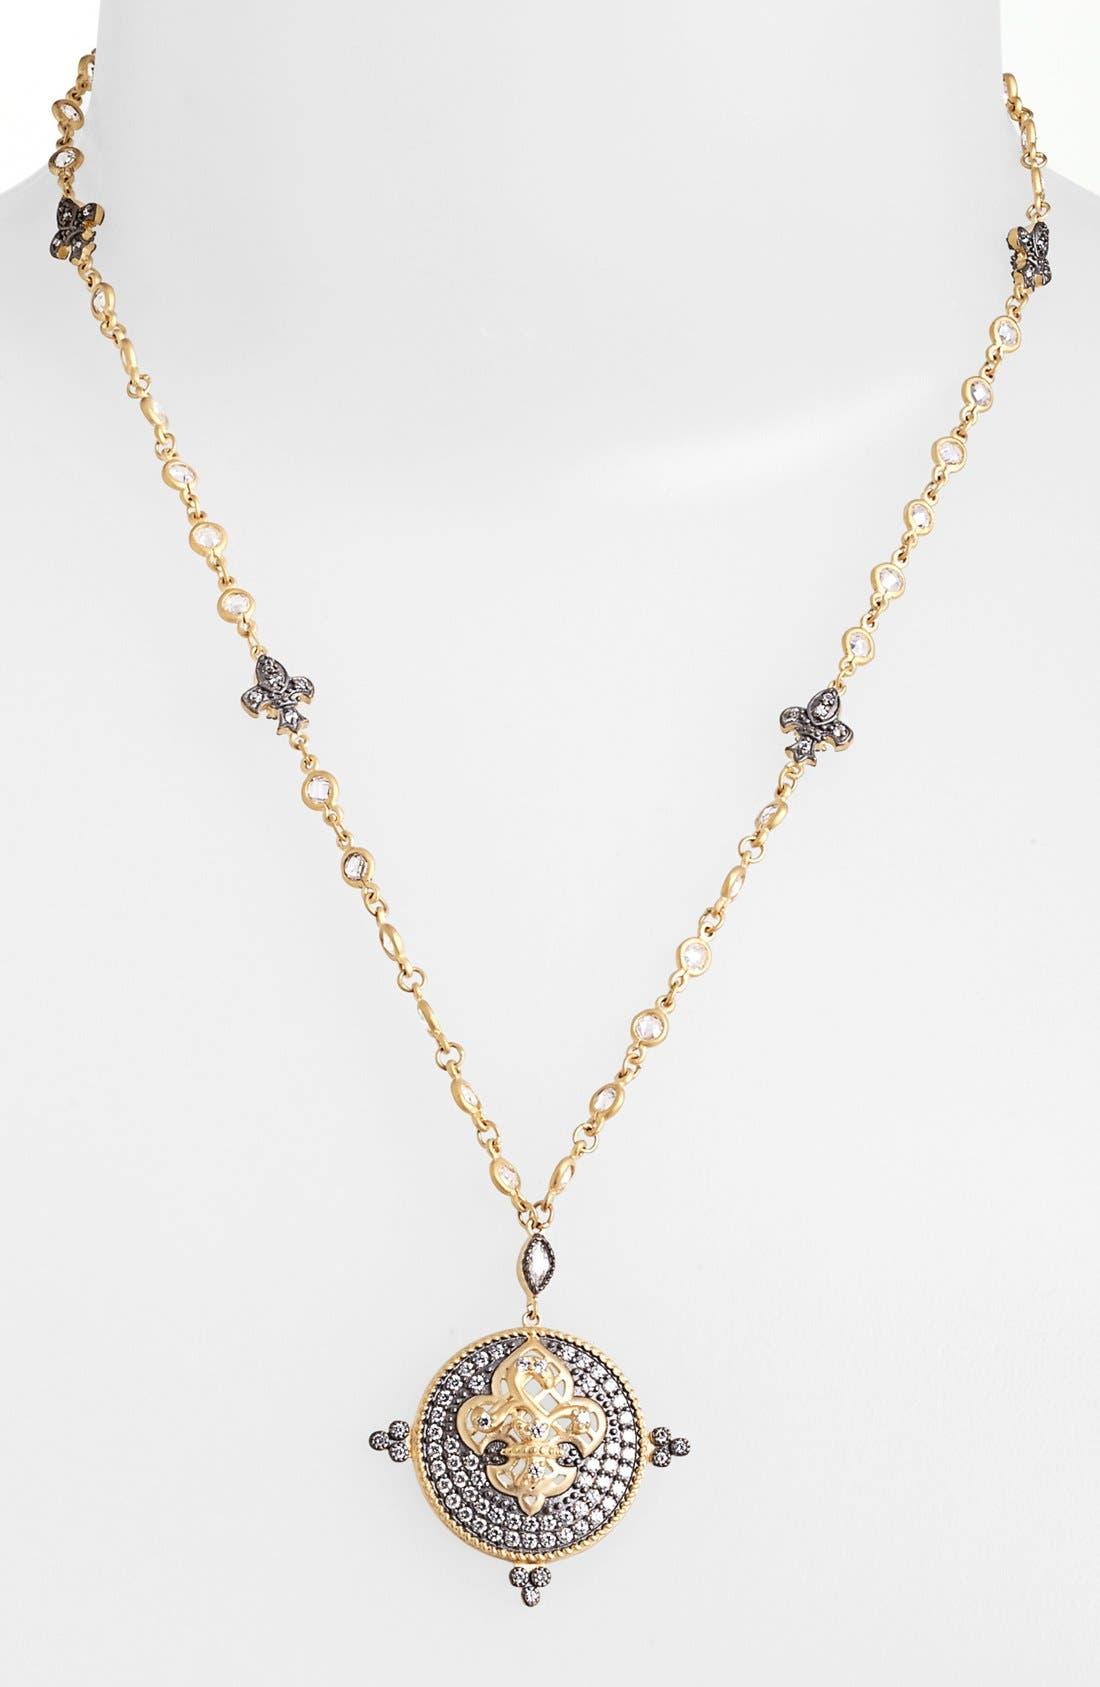 Main Image - FREIDA ROTHMAN 'Tribeca' Fleur de Lis Pendant Necklace